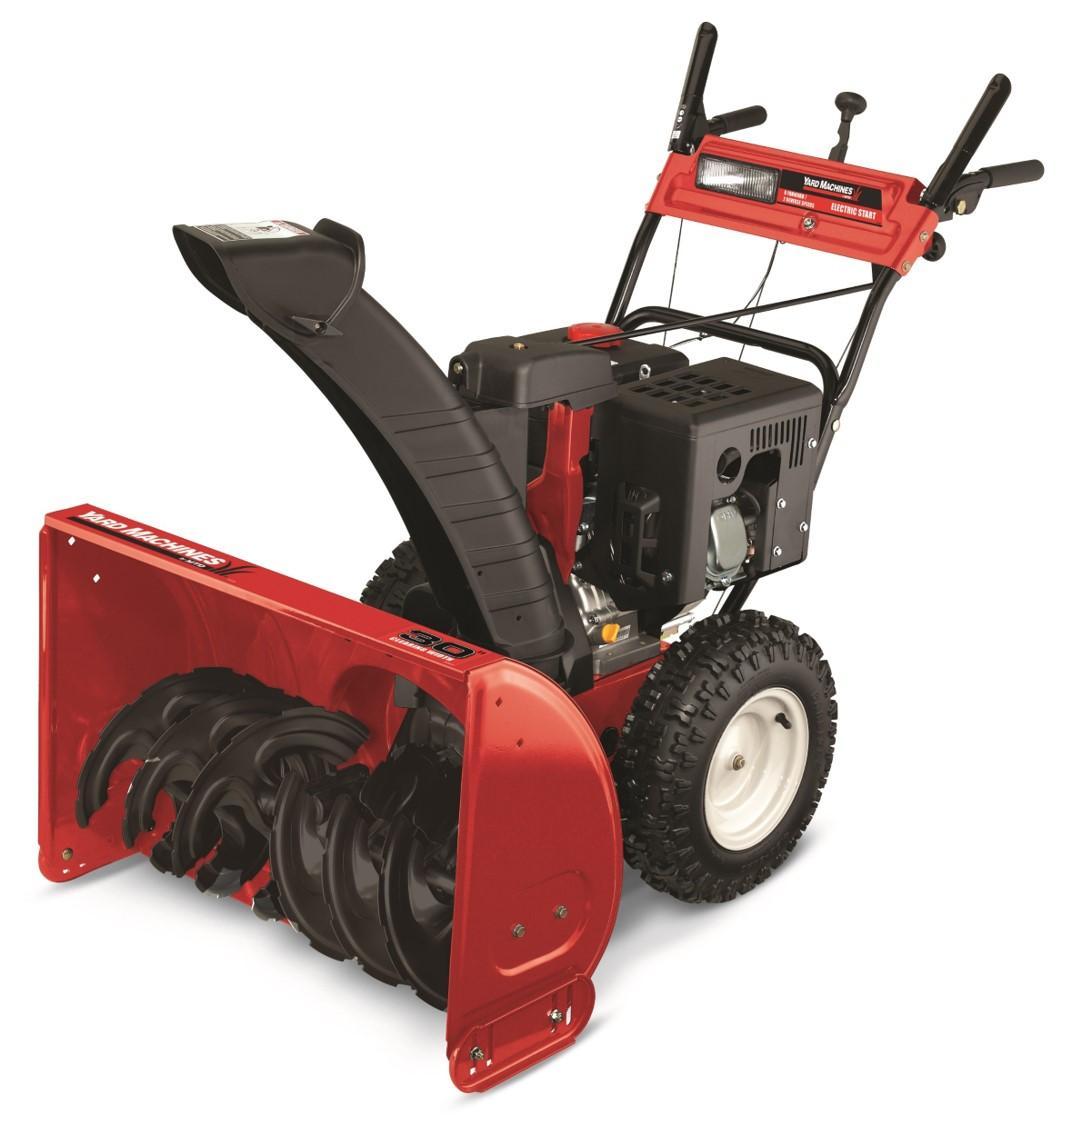 Amazon.com : Yard Machines 357cc 30-Inch Two-Stage Gas ...